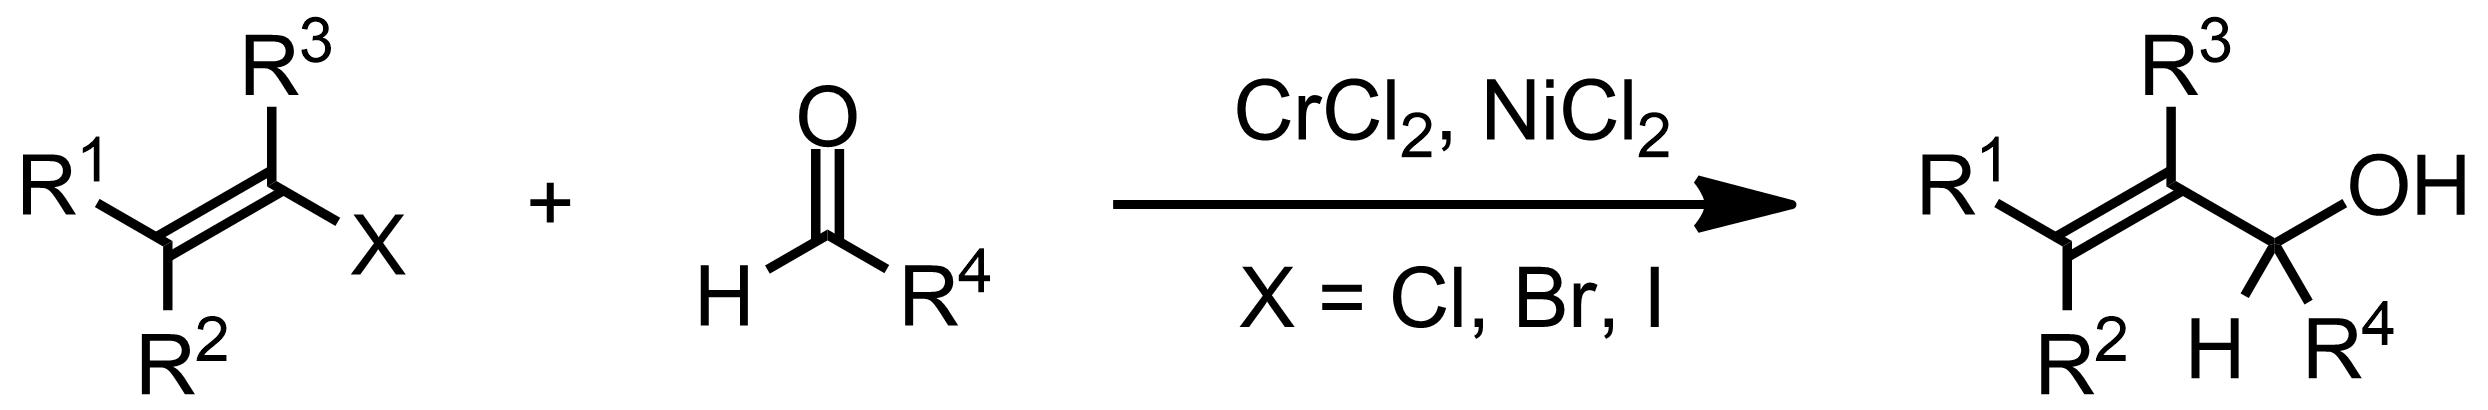 Schematic representation of the Nozaki-Hiyama-Kishi Reaction.